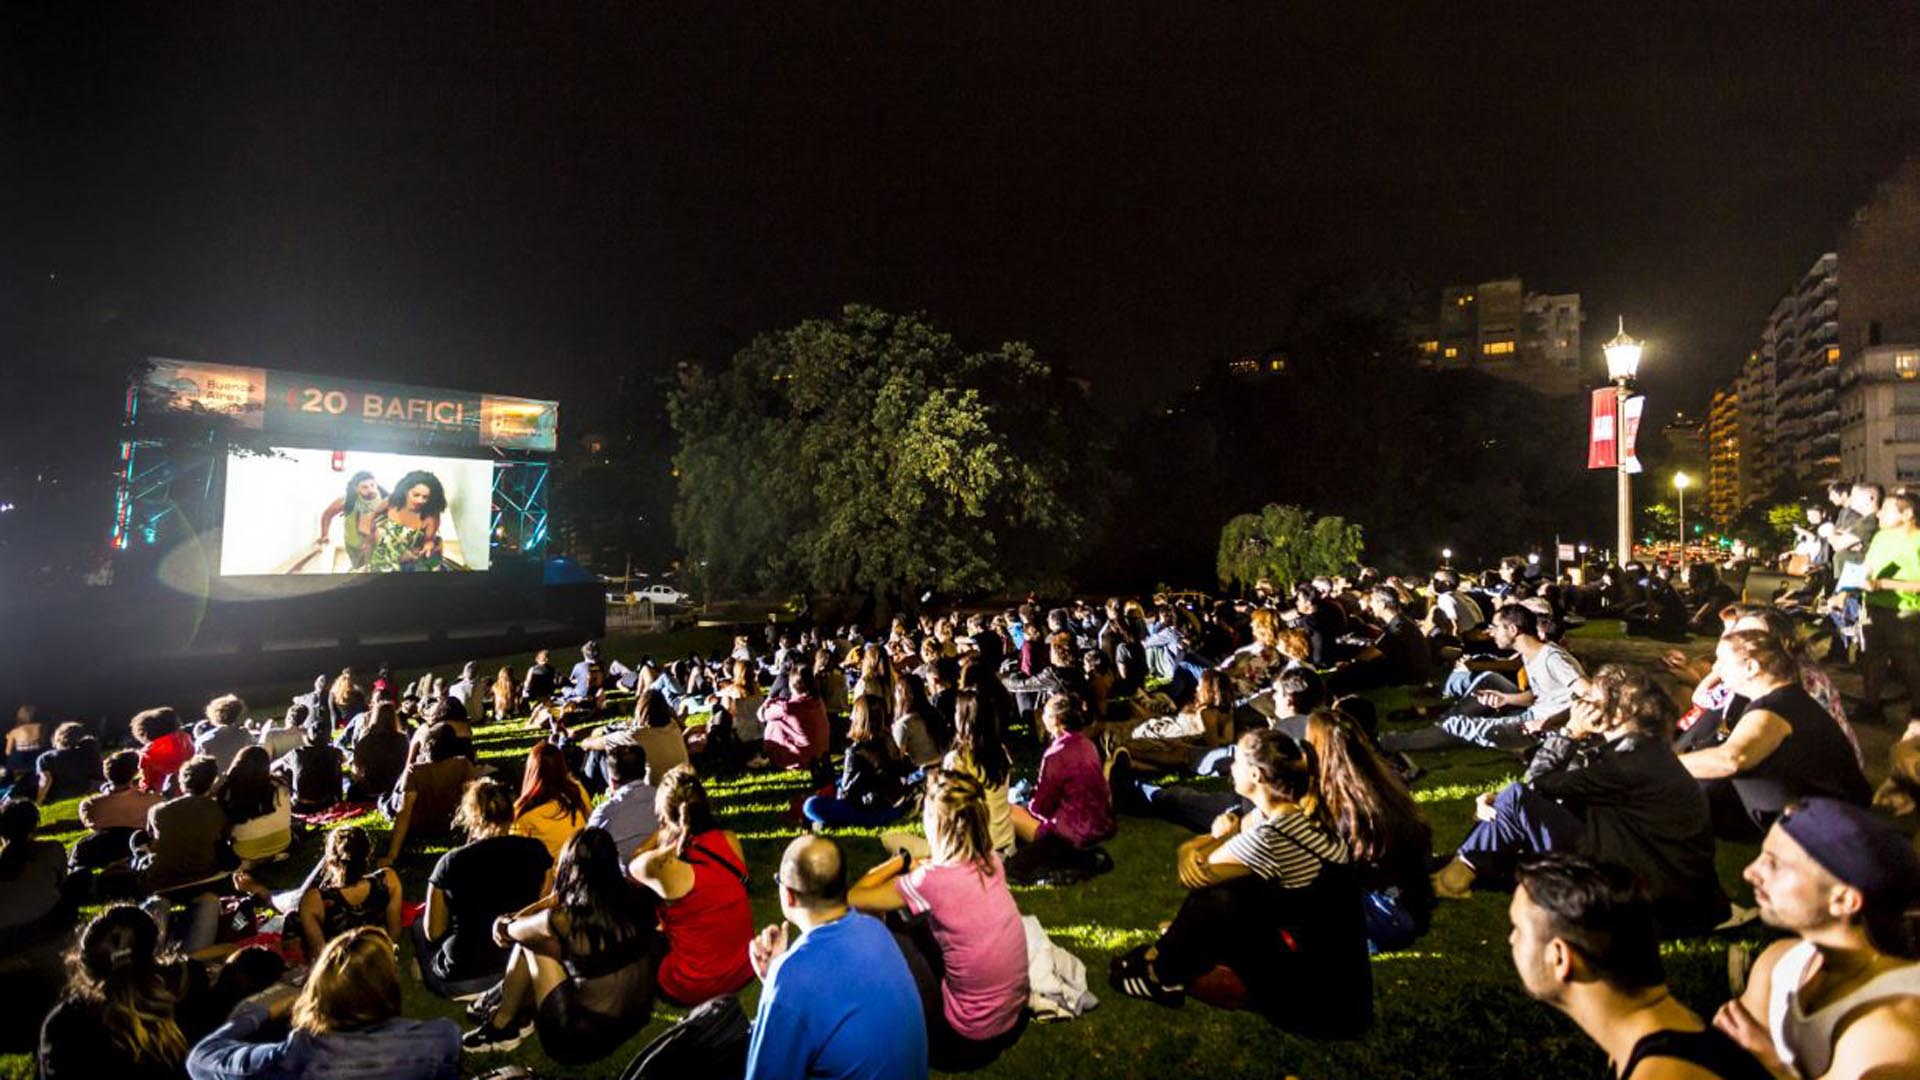 El Bafici tendrá 27 filmes de factura nacional